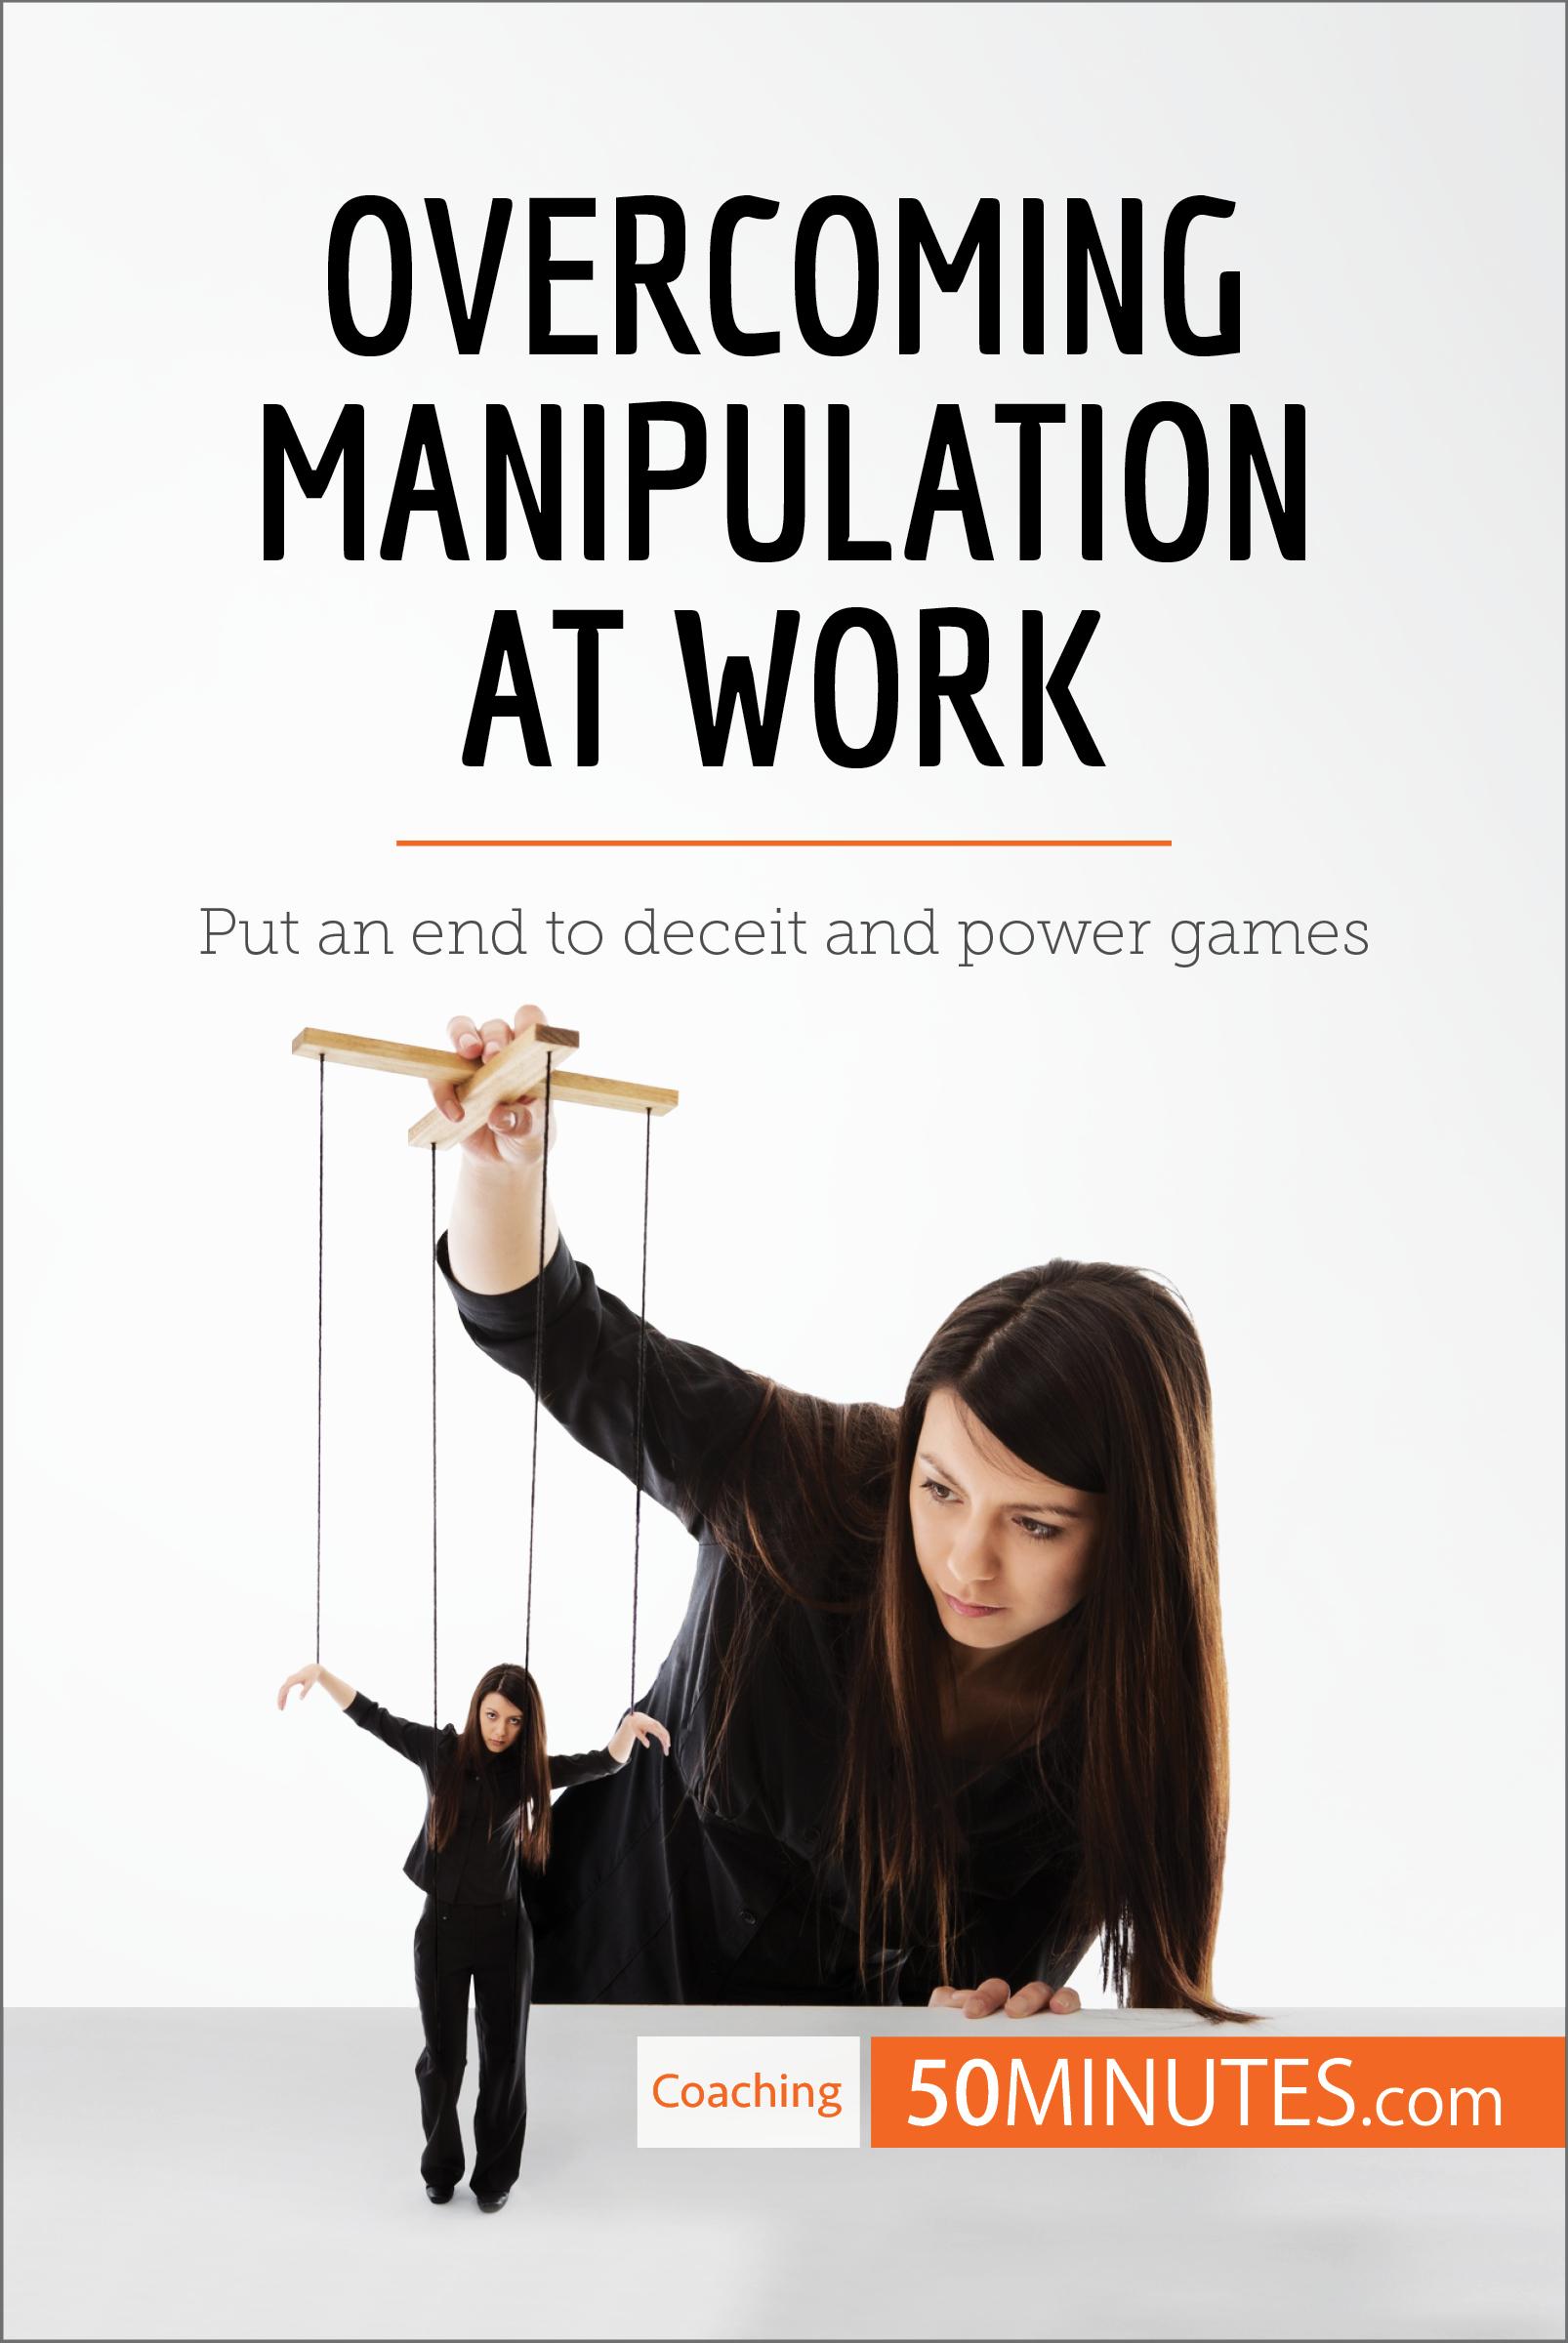 Overcoming Manipulation at Work